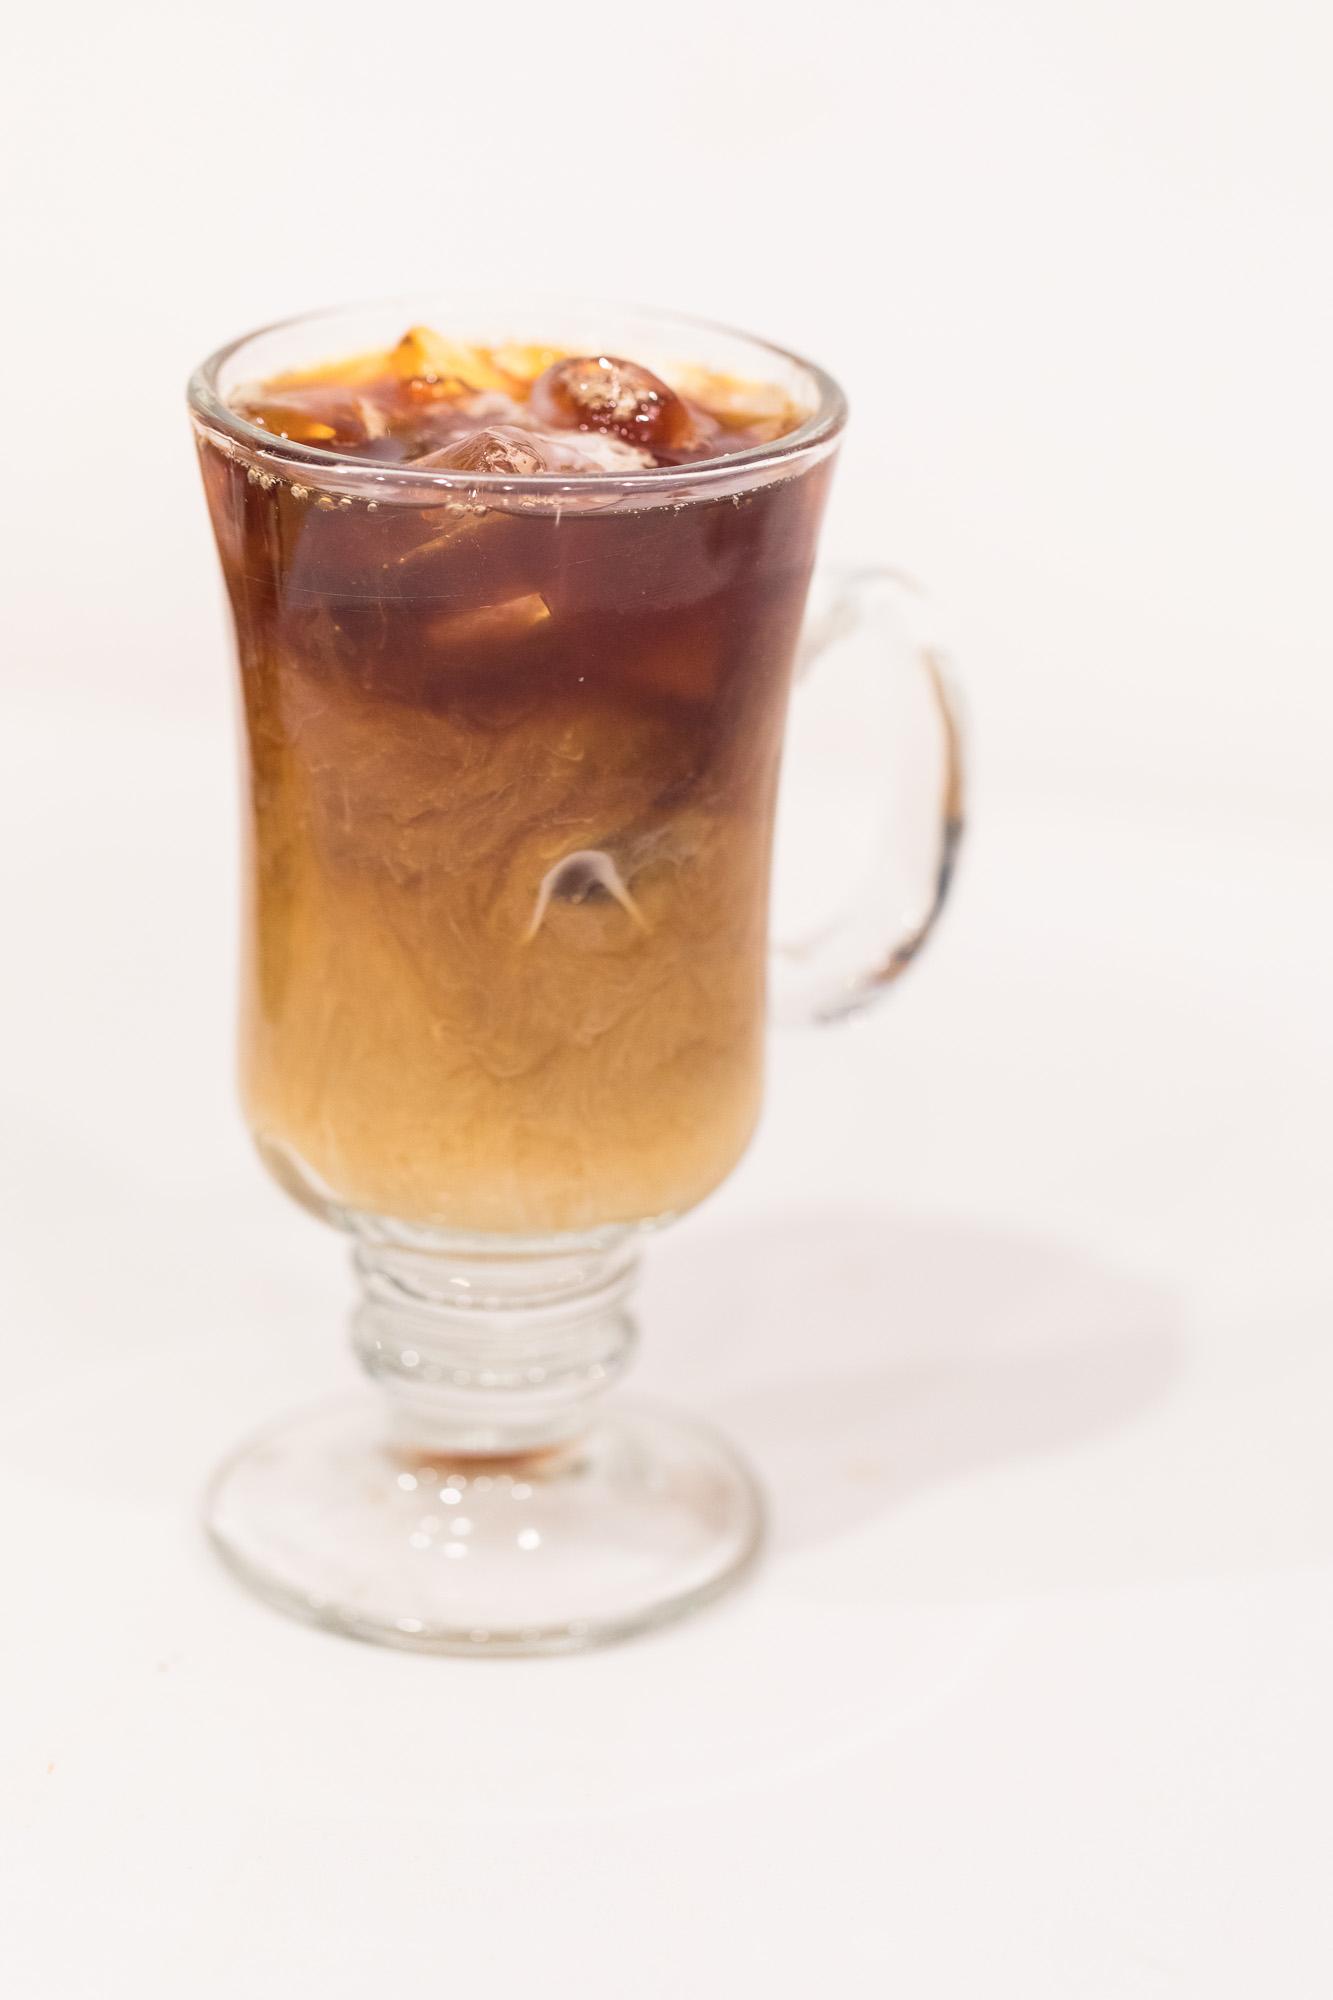 Maka-vegan-gluten-free-maui-cafe-coffee-2.jpg